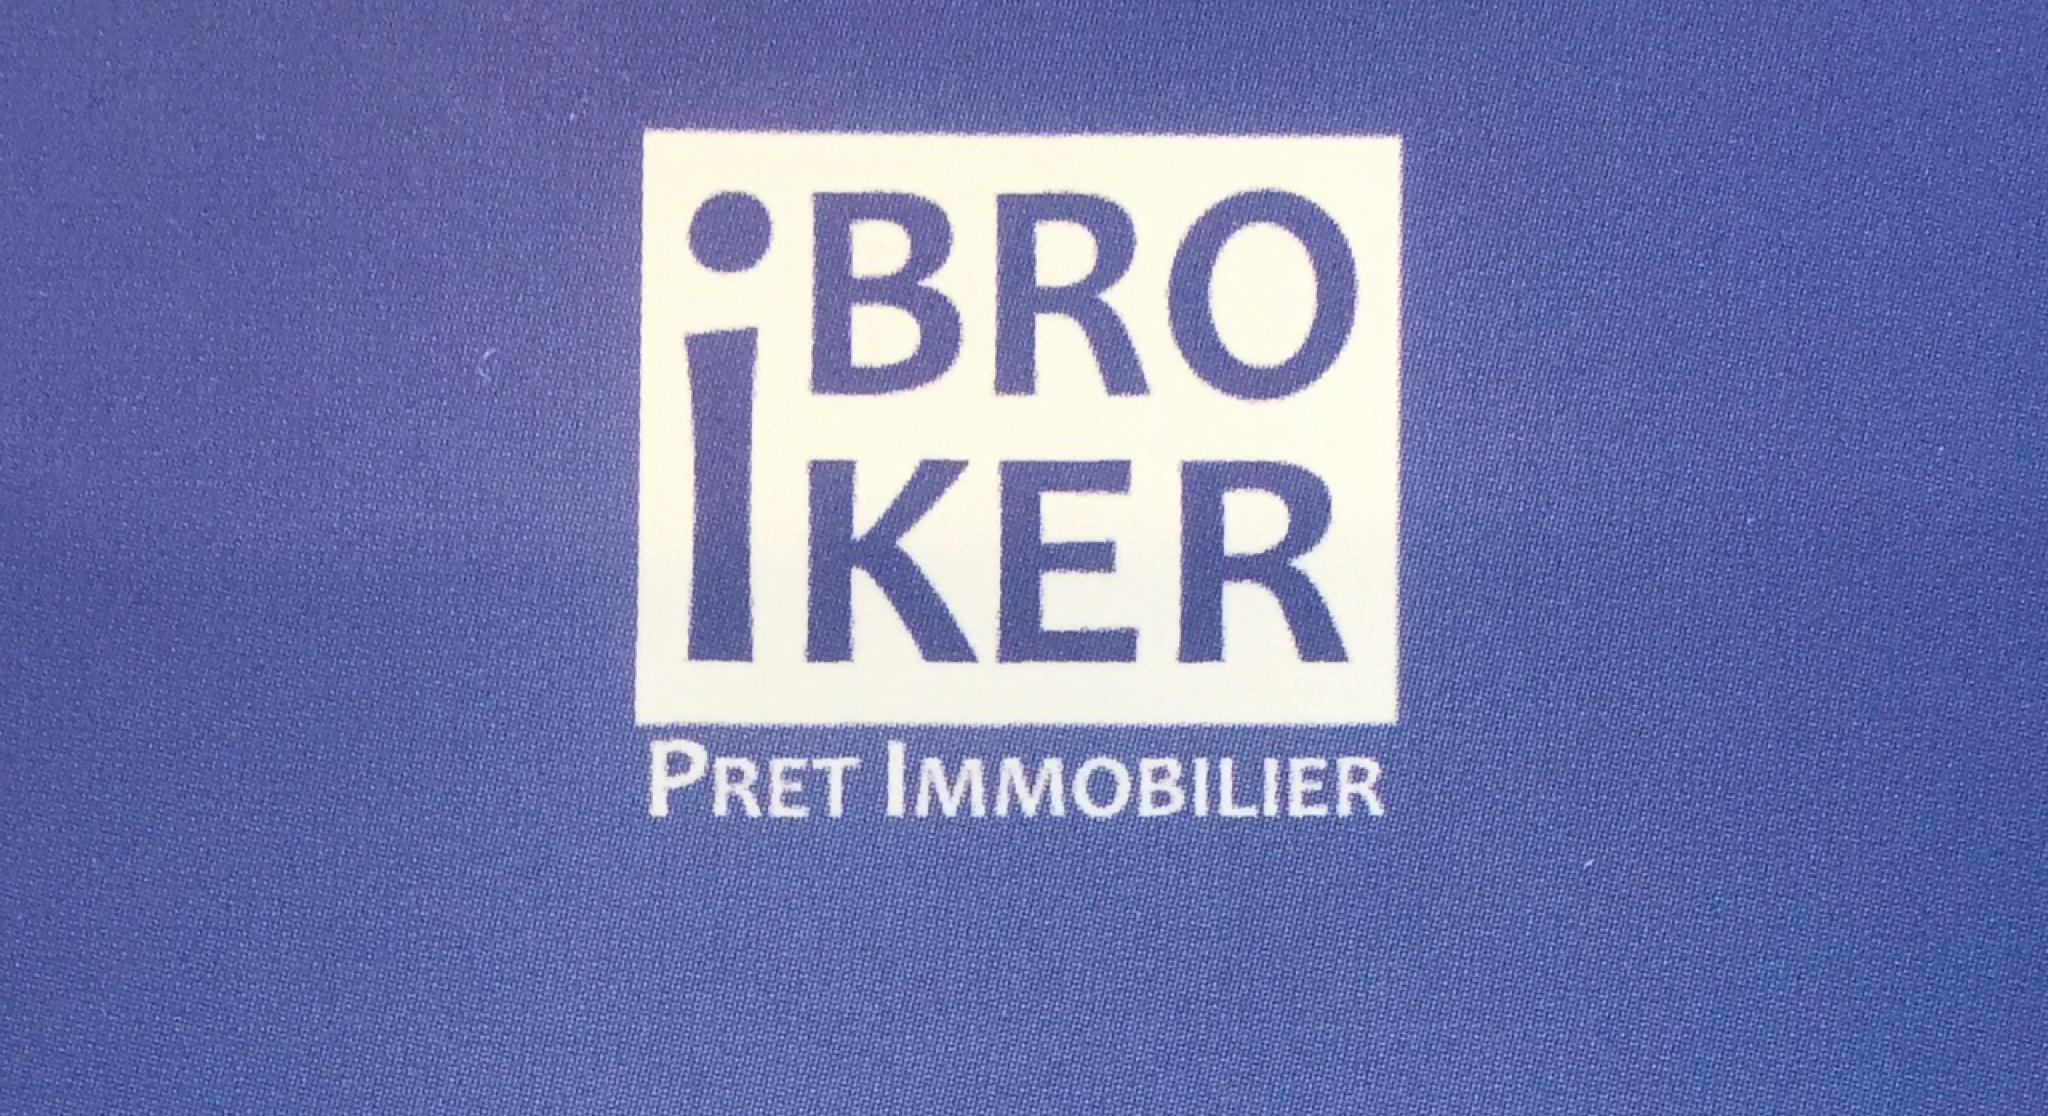 Partenaires de notre agence - Renegociation pret immobilier ...